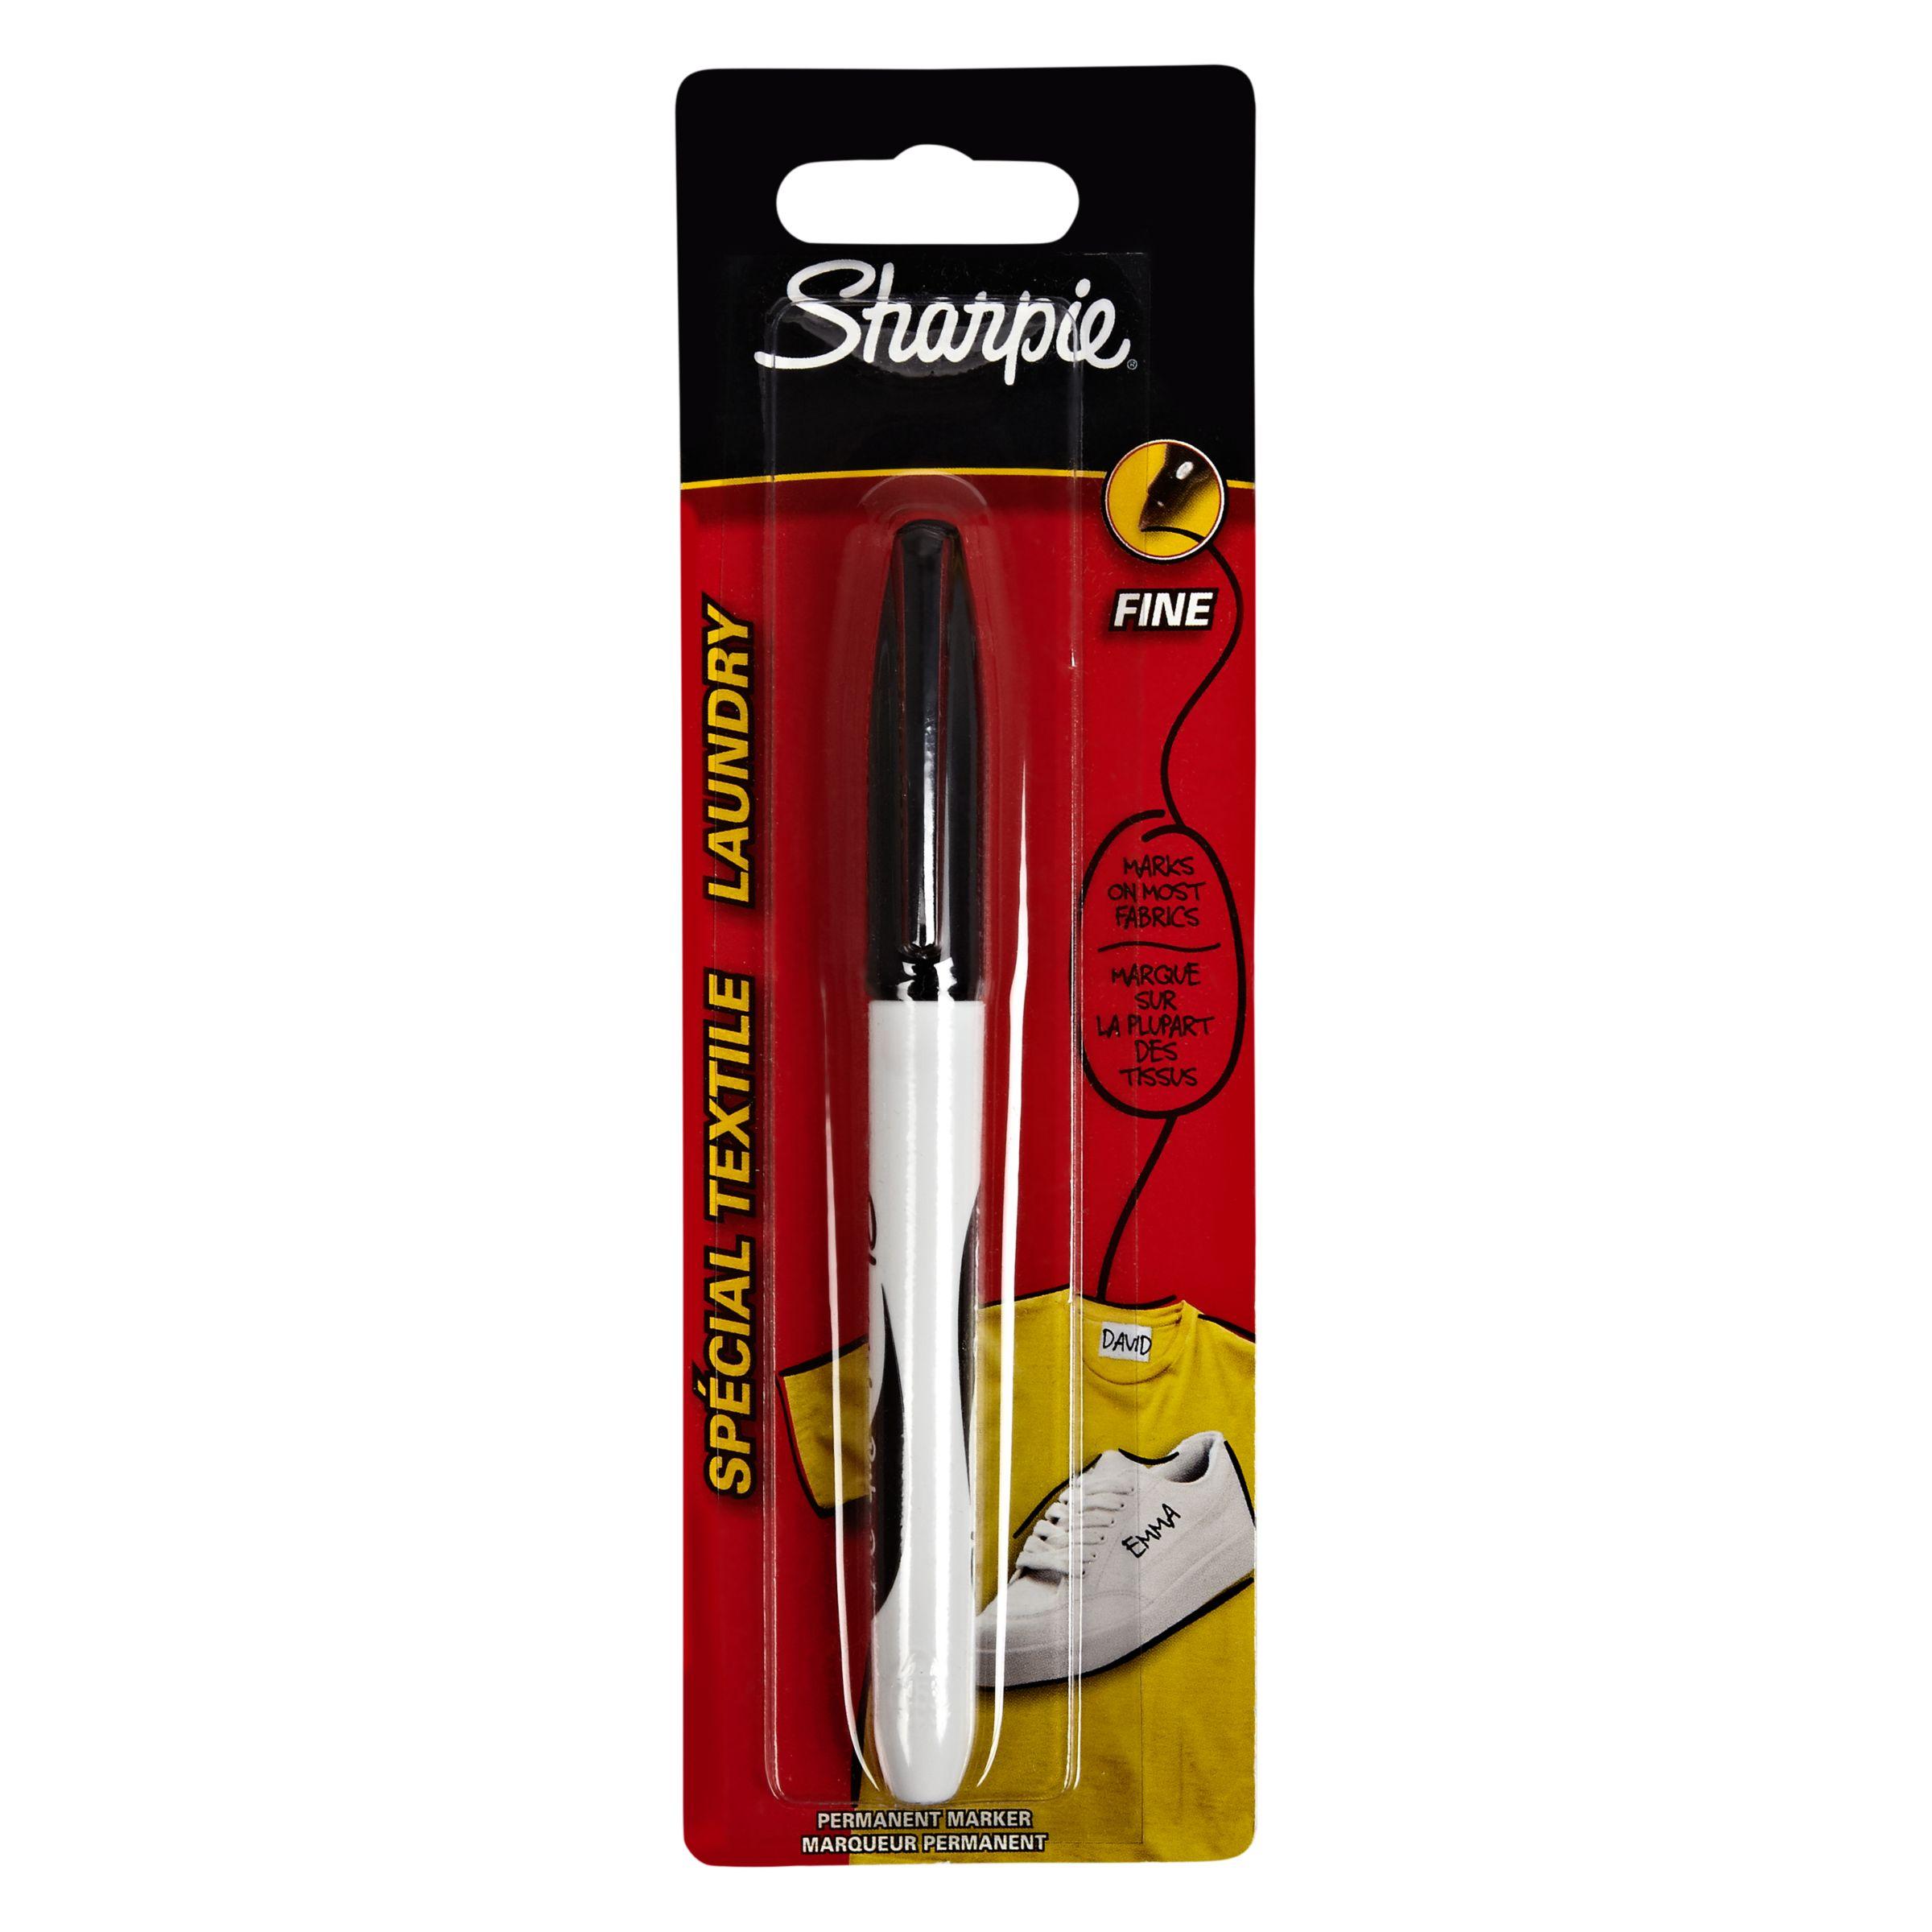 Sharpie Sharpie Laundry Marker, Black